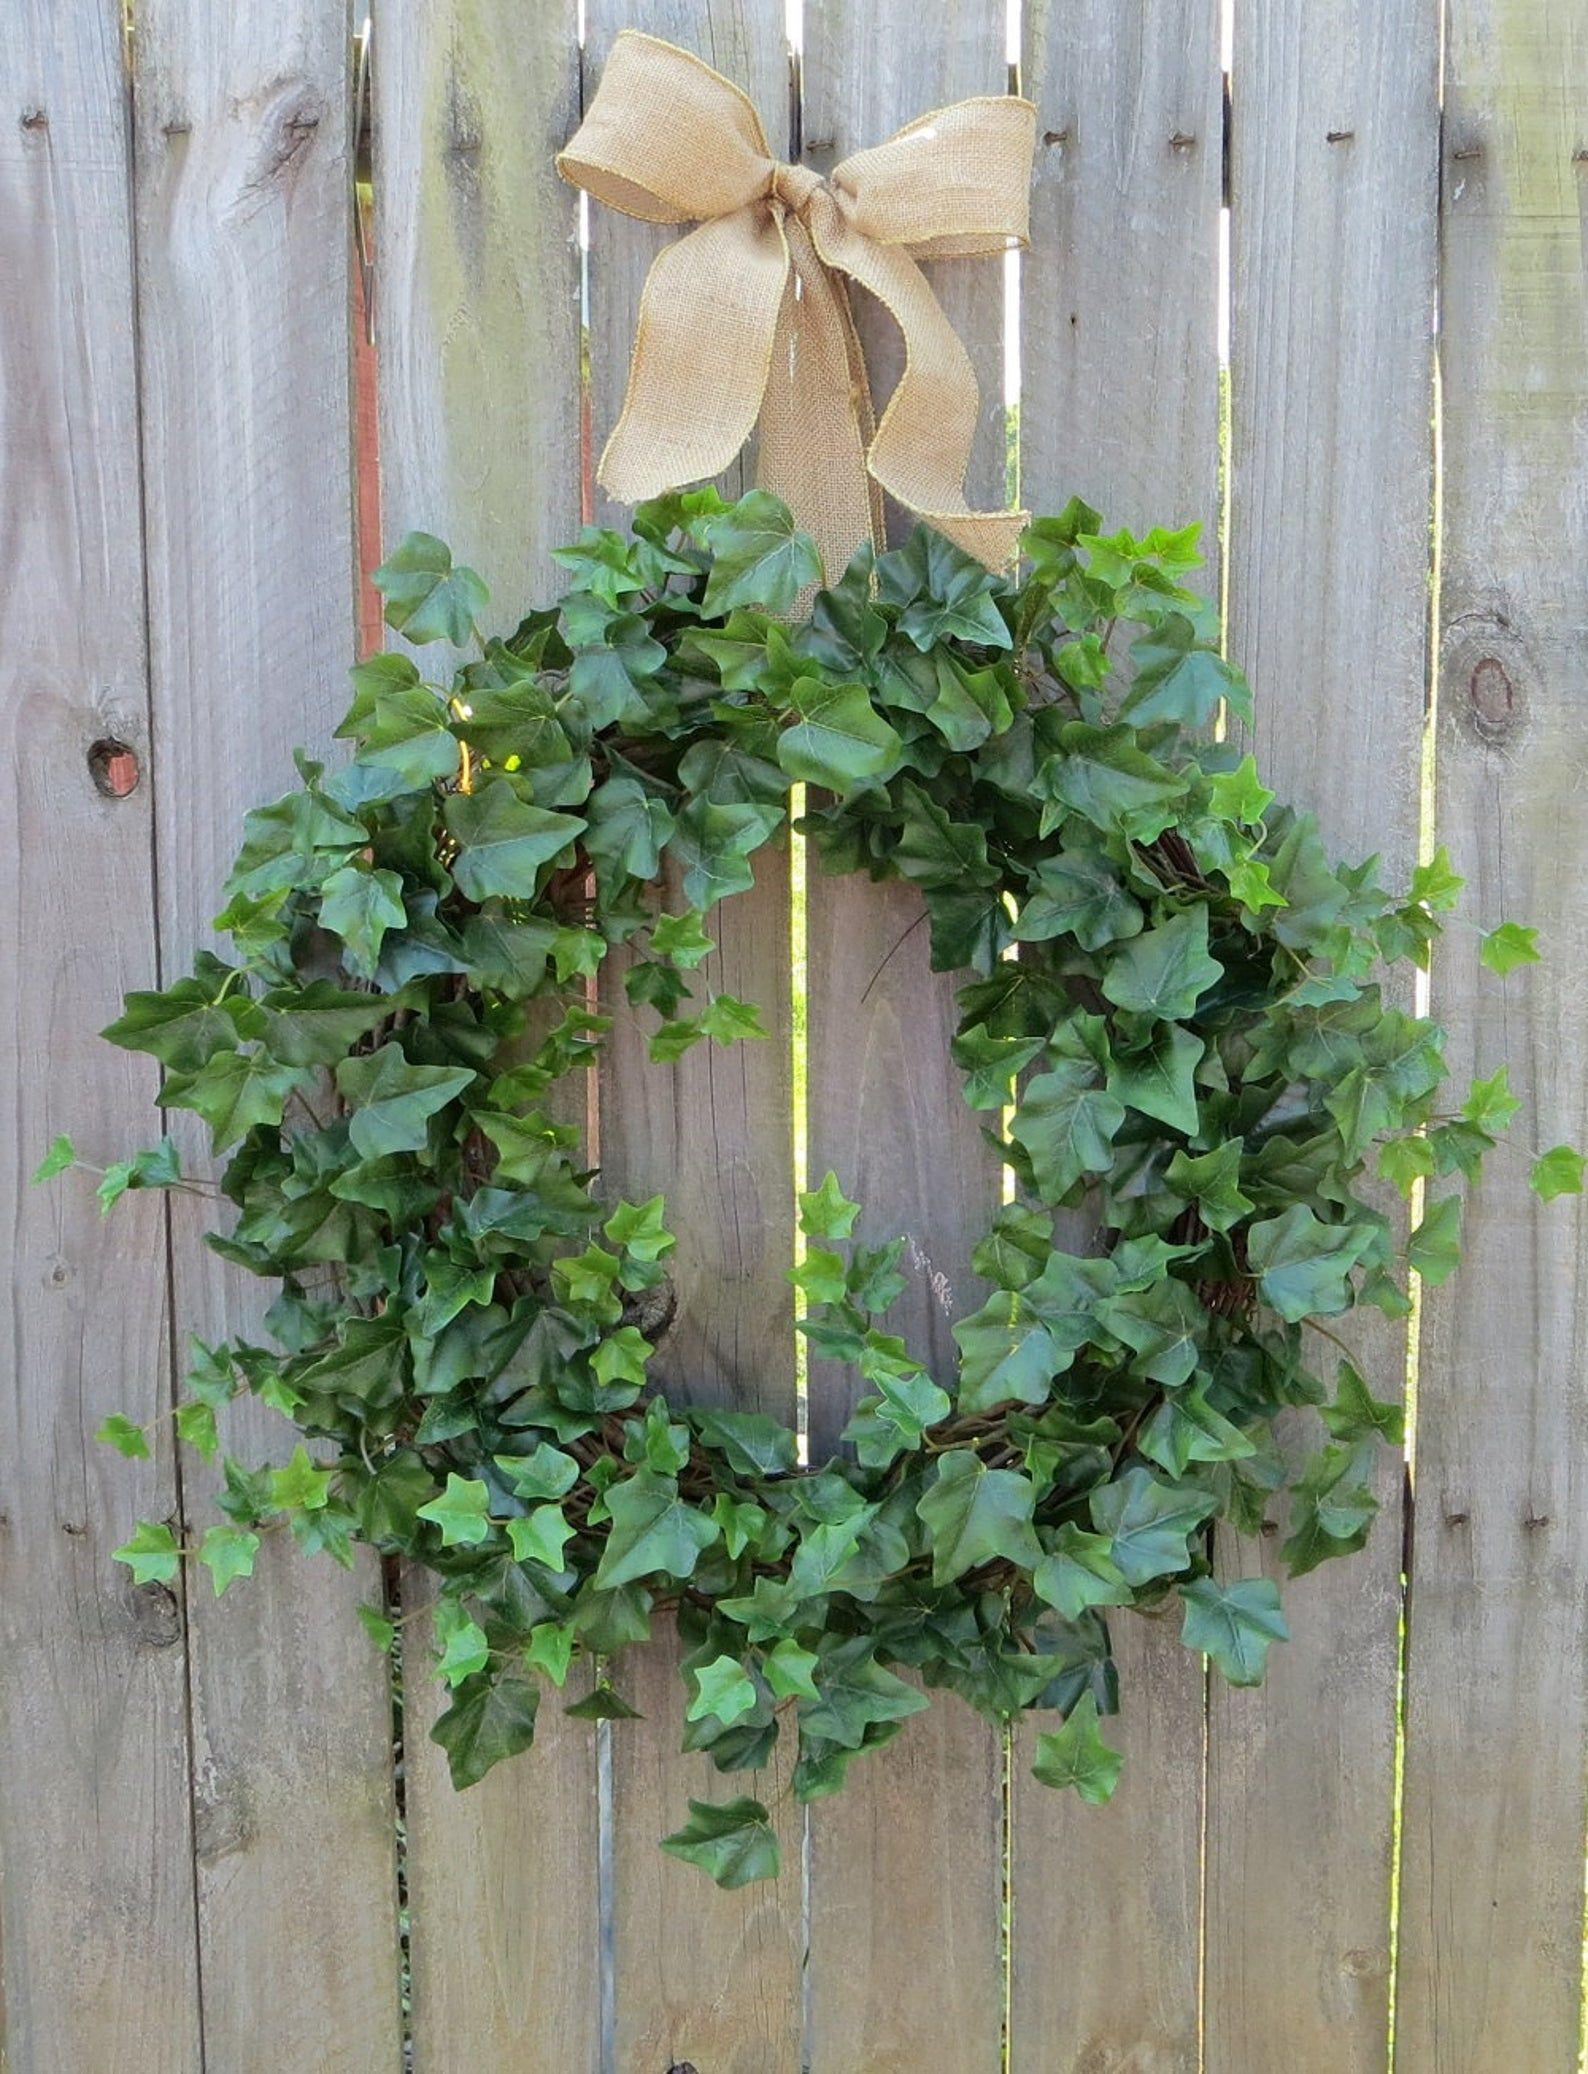 Photo of Spring Summer Wreaths, Ivy, Wreaths and Burlap Bow for Year, Year Wreaths, HornsHandmade, Etsy Wreaths